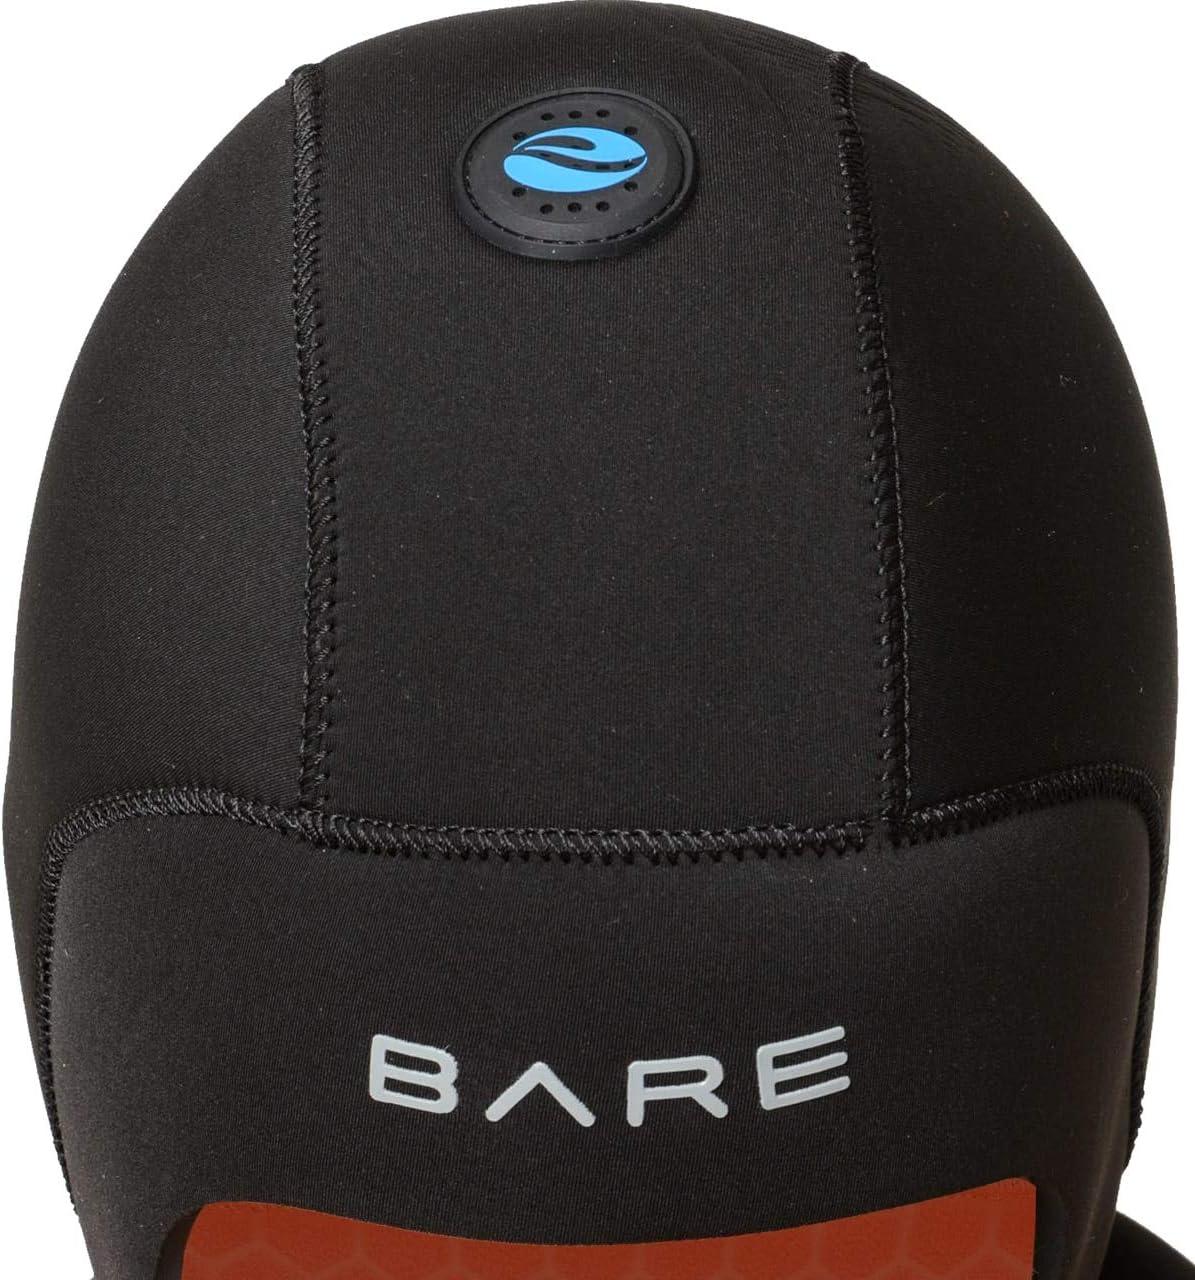 Bare 7mm Ultrawarmth Dry Hood Scuba Diving Hood